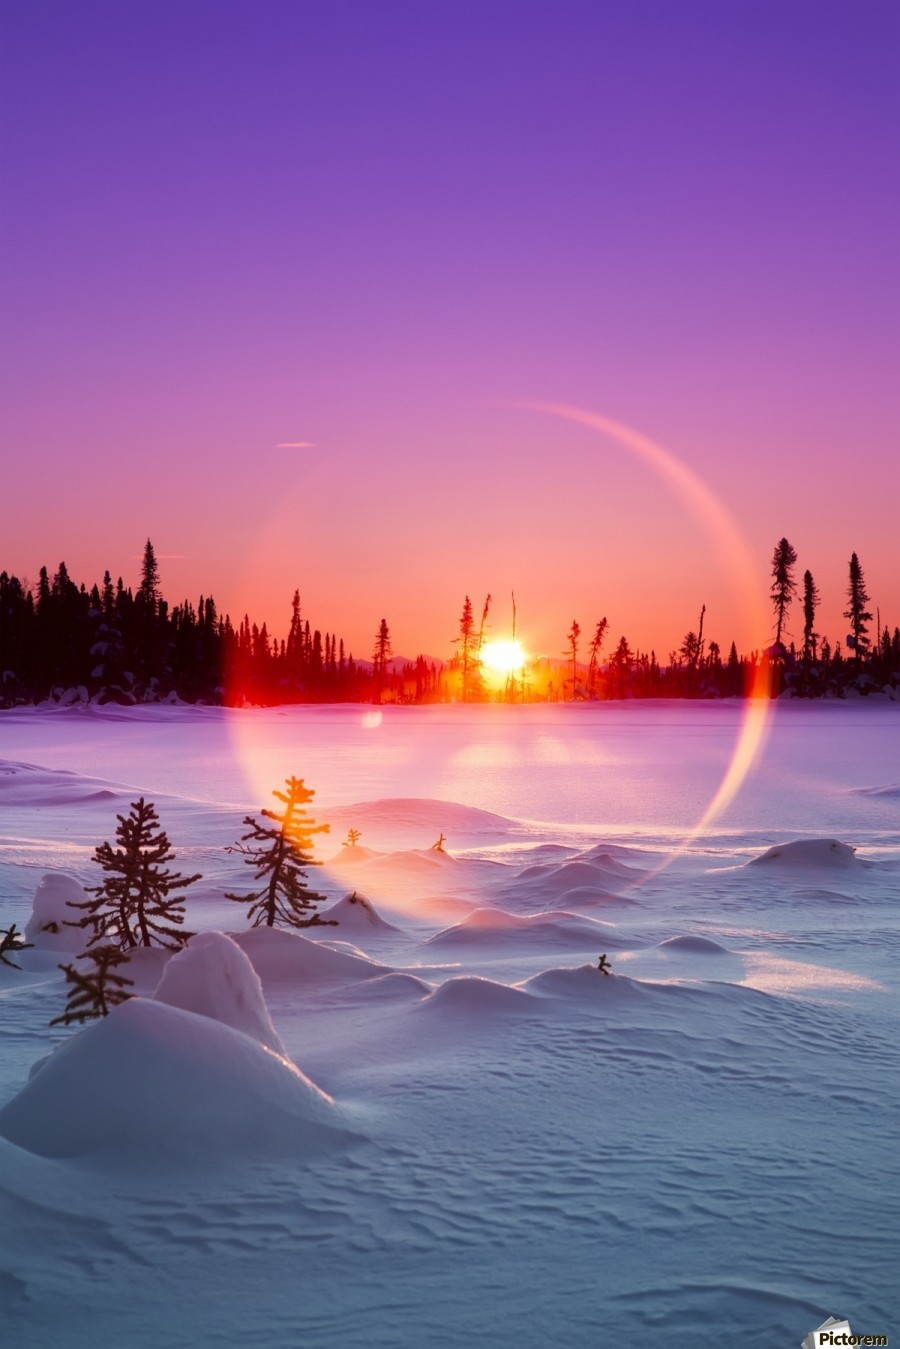 Sun flare glowing over a winter landscape; Trapper Creek, Alaska, United States of America  Print